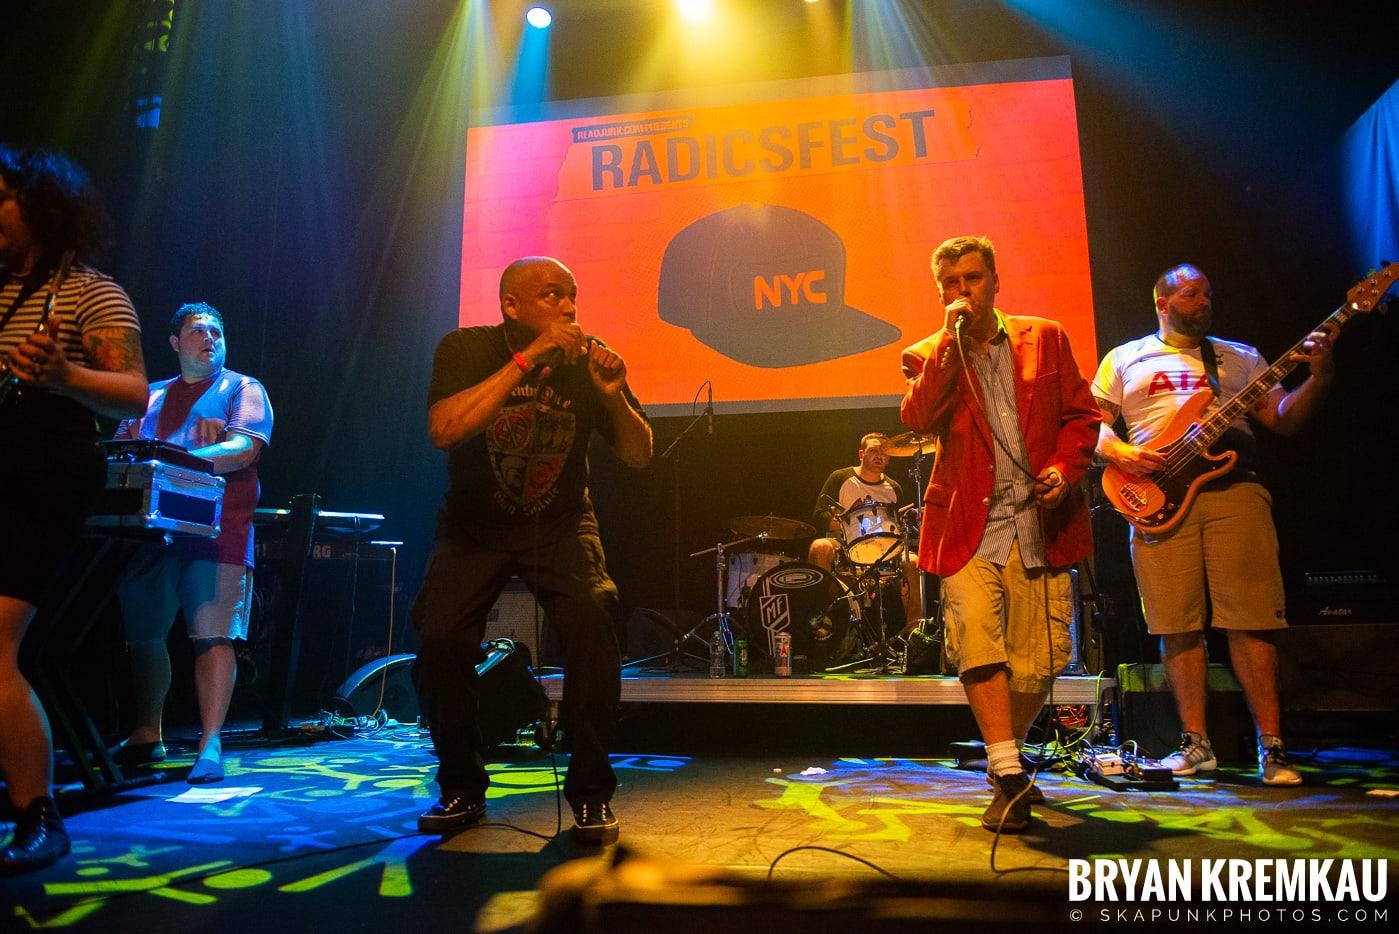 Hub City Stompers @ Radicsfest, Gramercy Theatre, NYC - 7.19.19 (7)